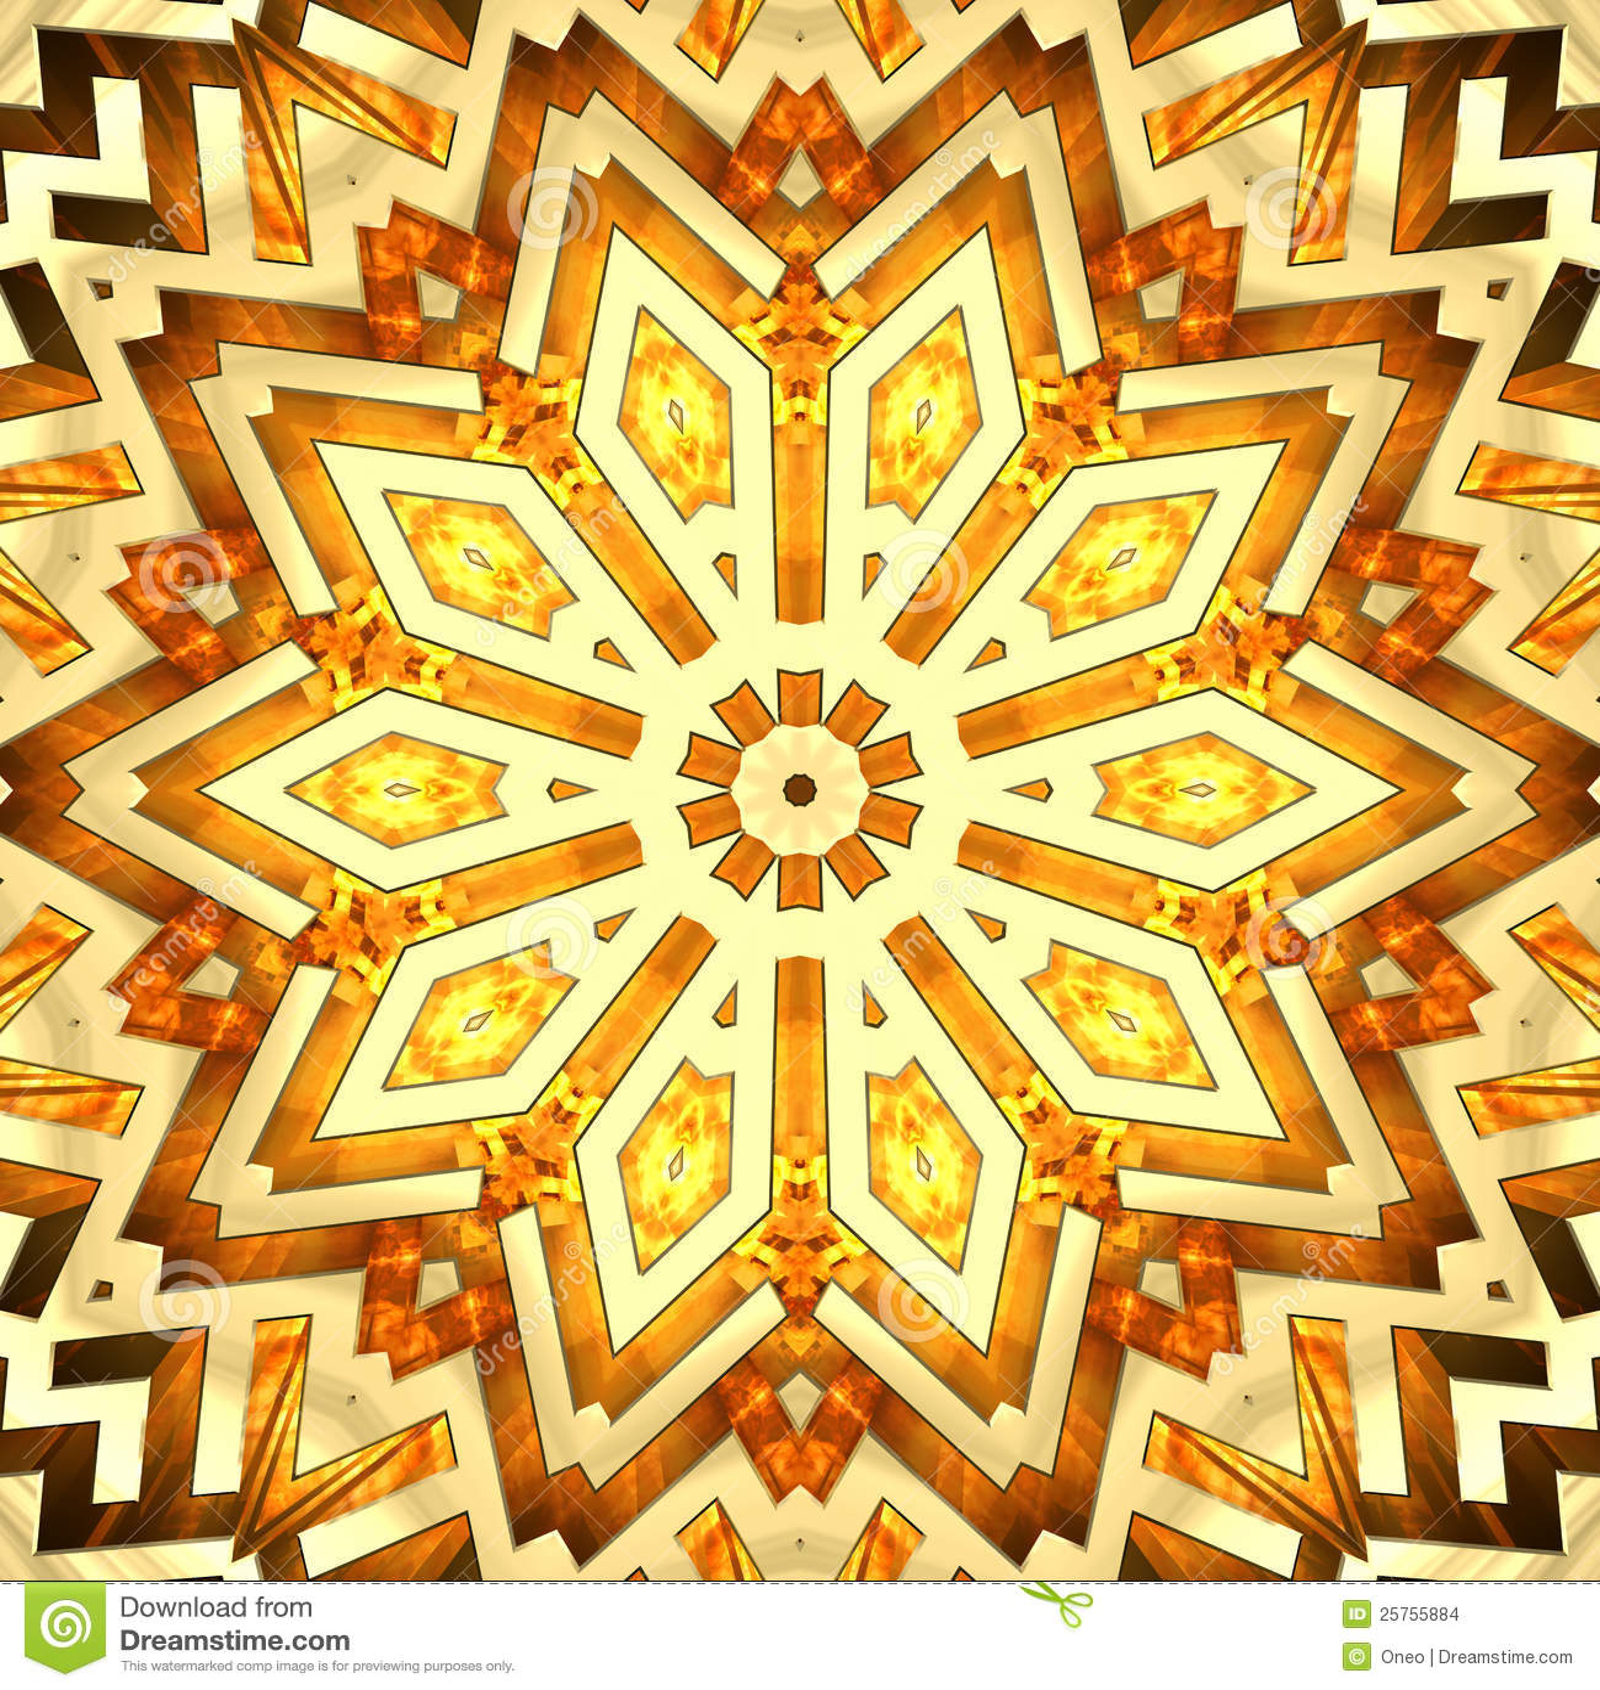 Shiny golden kaleidoscope star